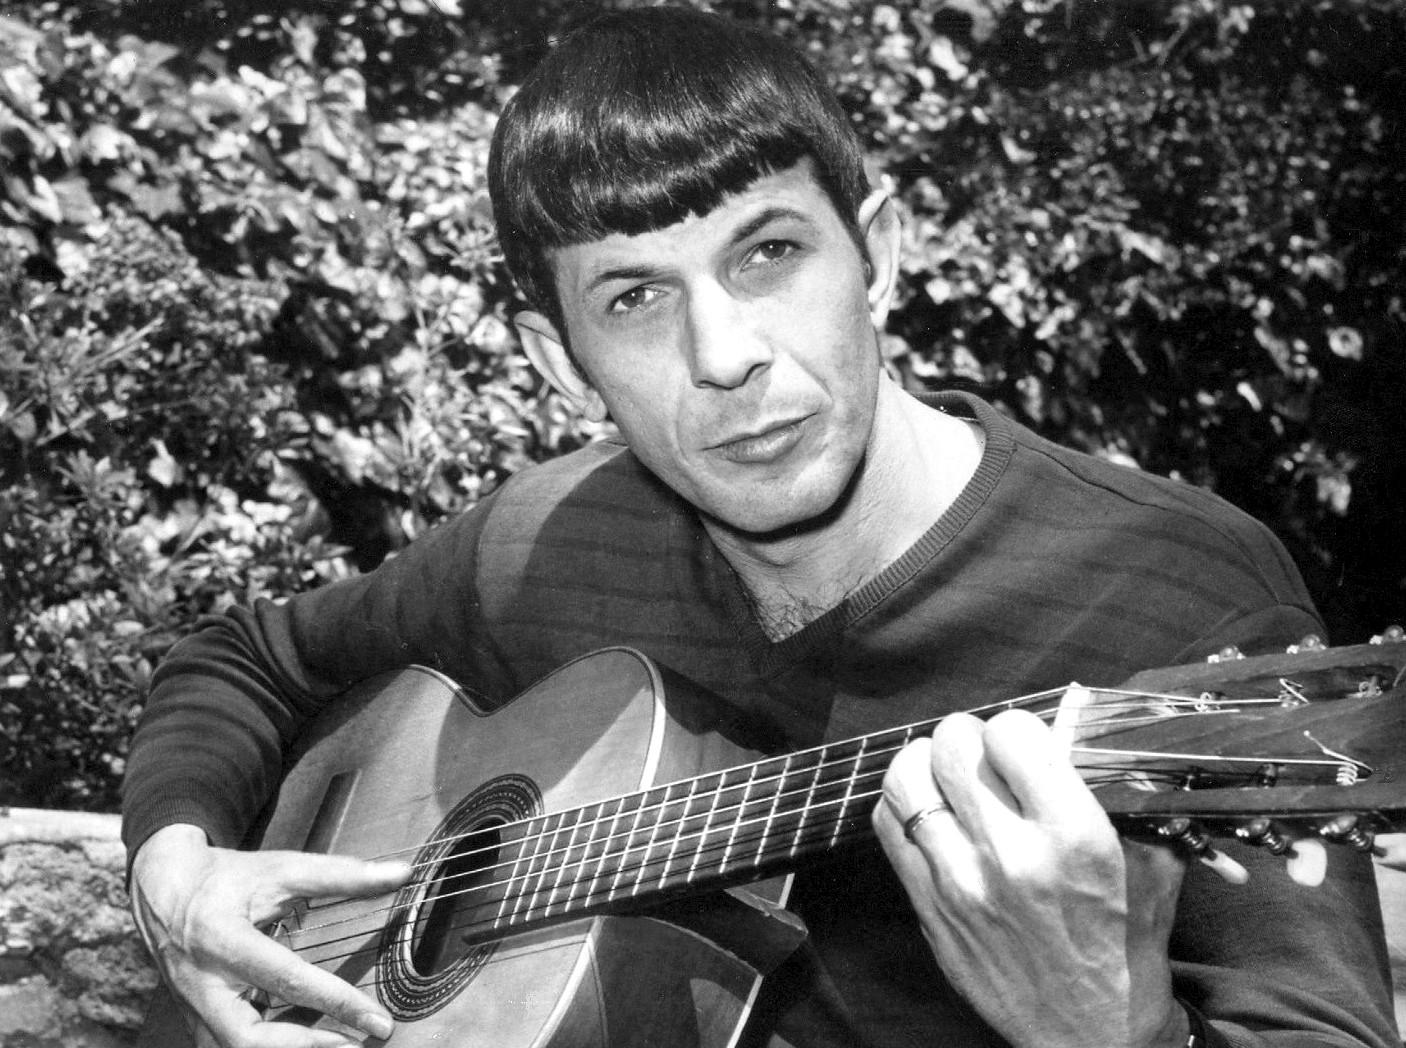 Spock Illogical Guitar